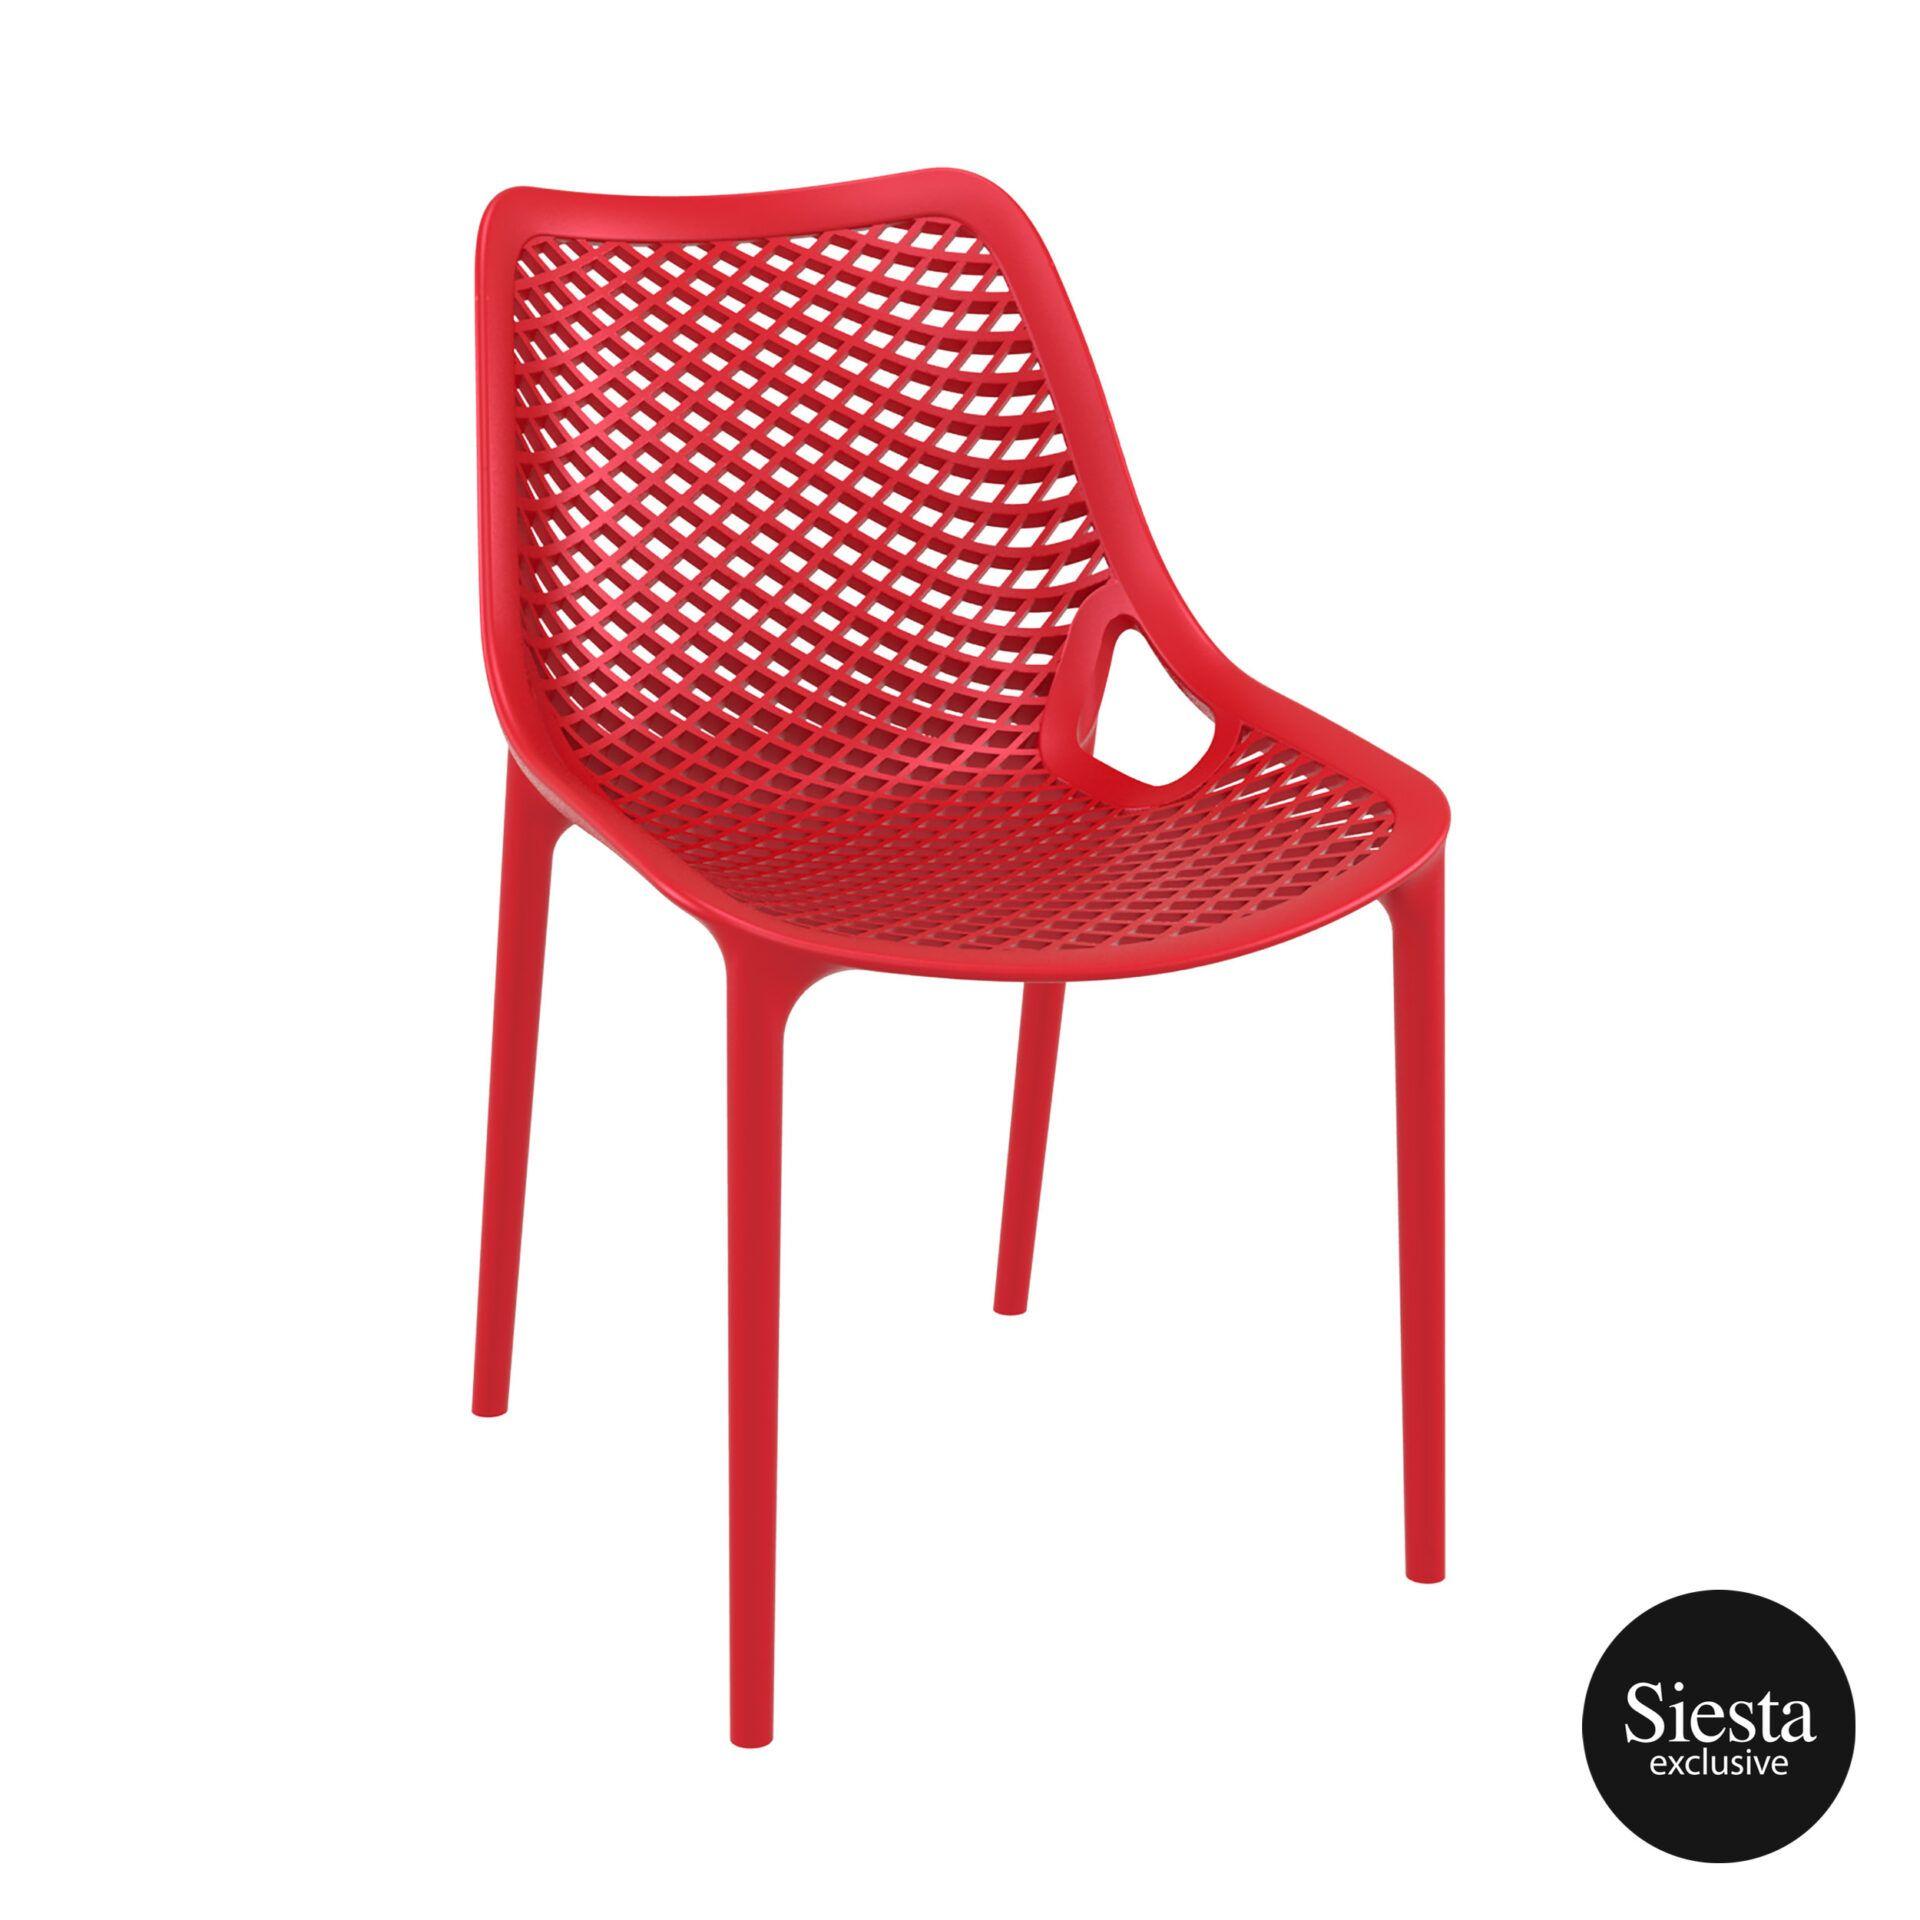 original siesta air chair red front side 1